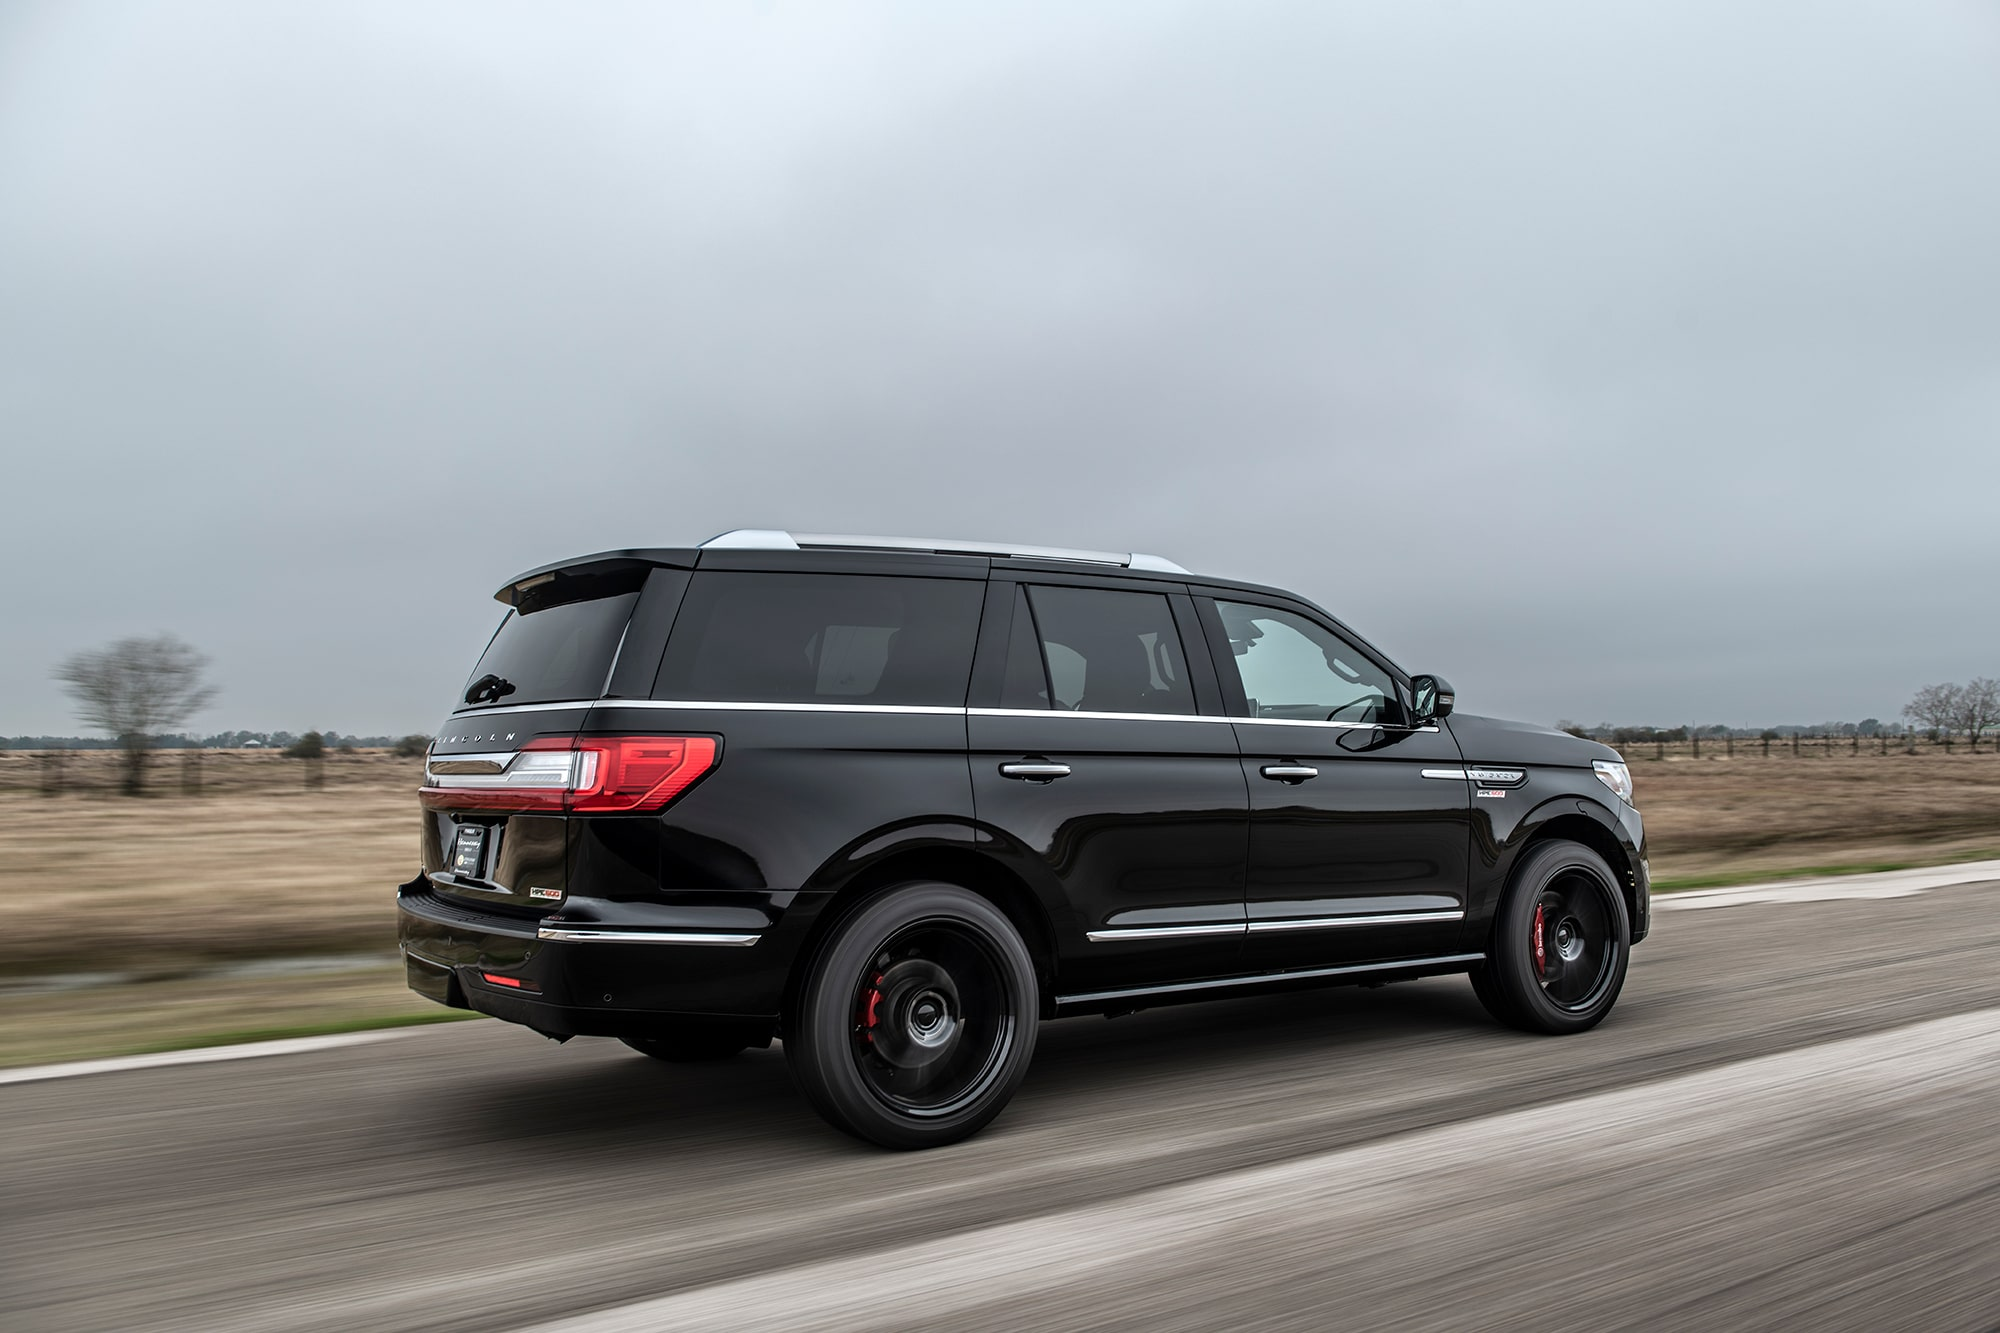 Hennessey HPE600 Lincoln Navigator 2019 07-hennessey-lincoln-navigator-hpe600-min